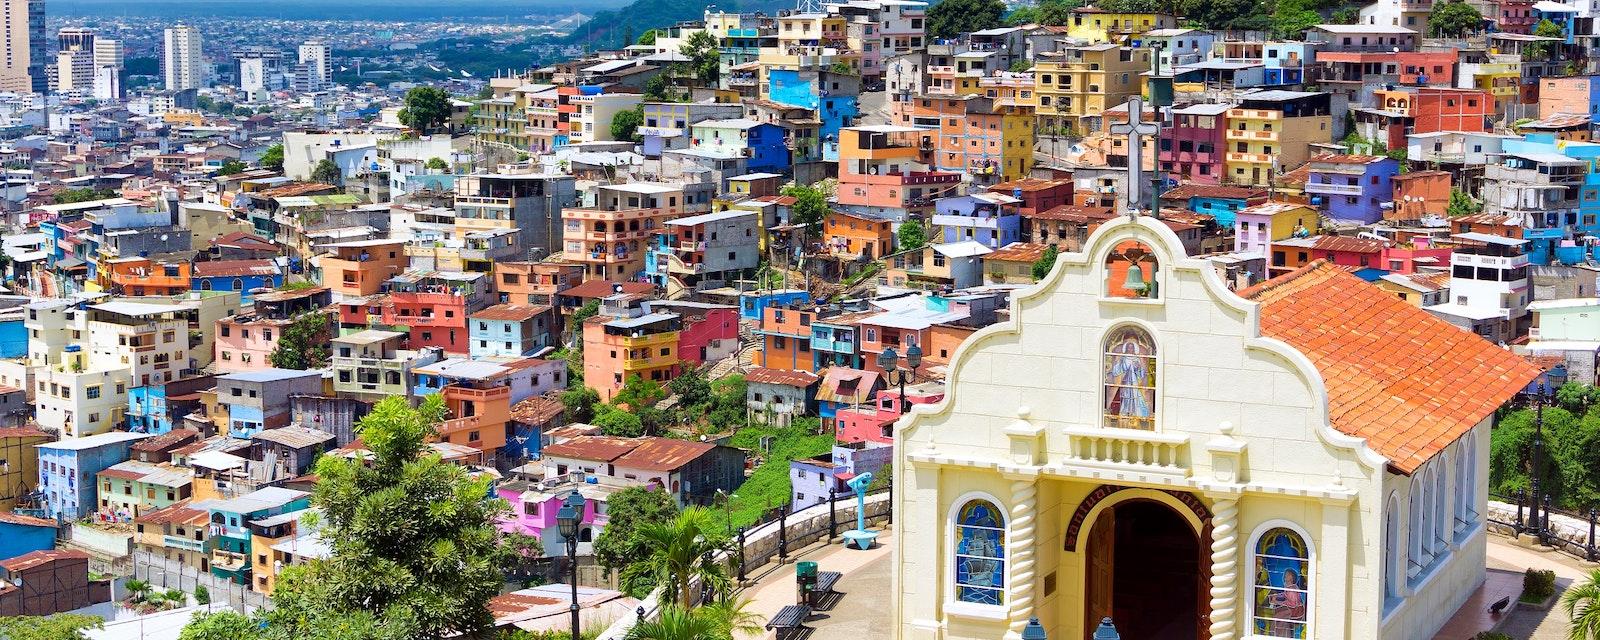 Church,In,The,City,Of,Guayaquil,,Ecuador,On,Santa,Ana